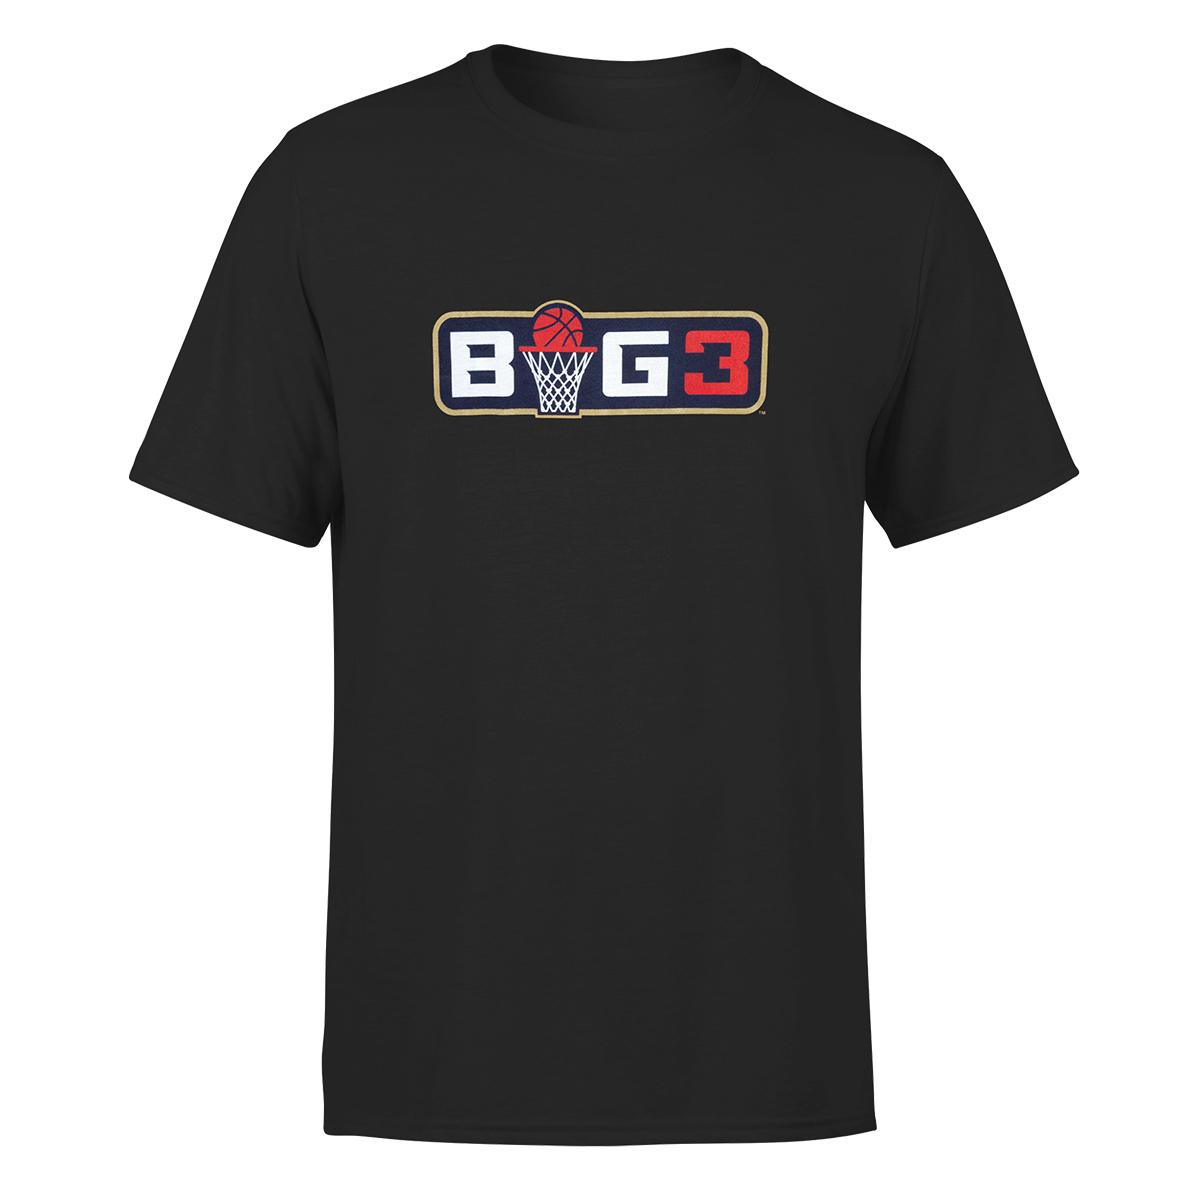 Big3 Black Logo T-shirt